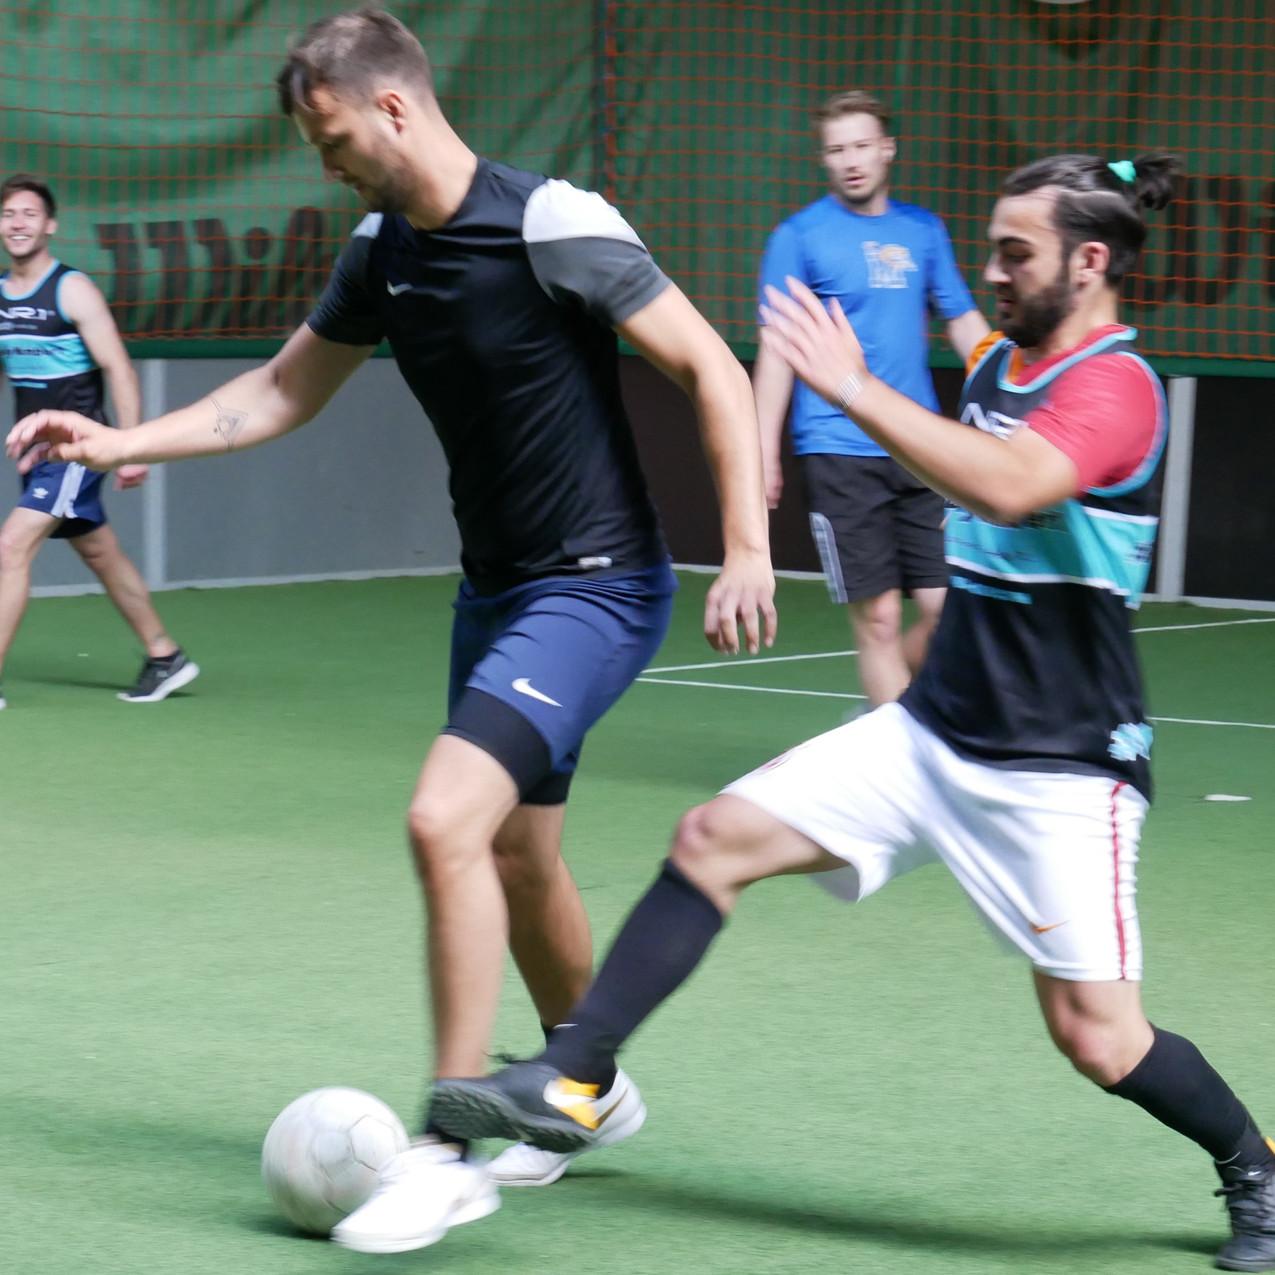 Soccer-Cup 2018 Ulm